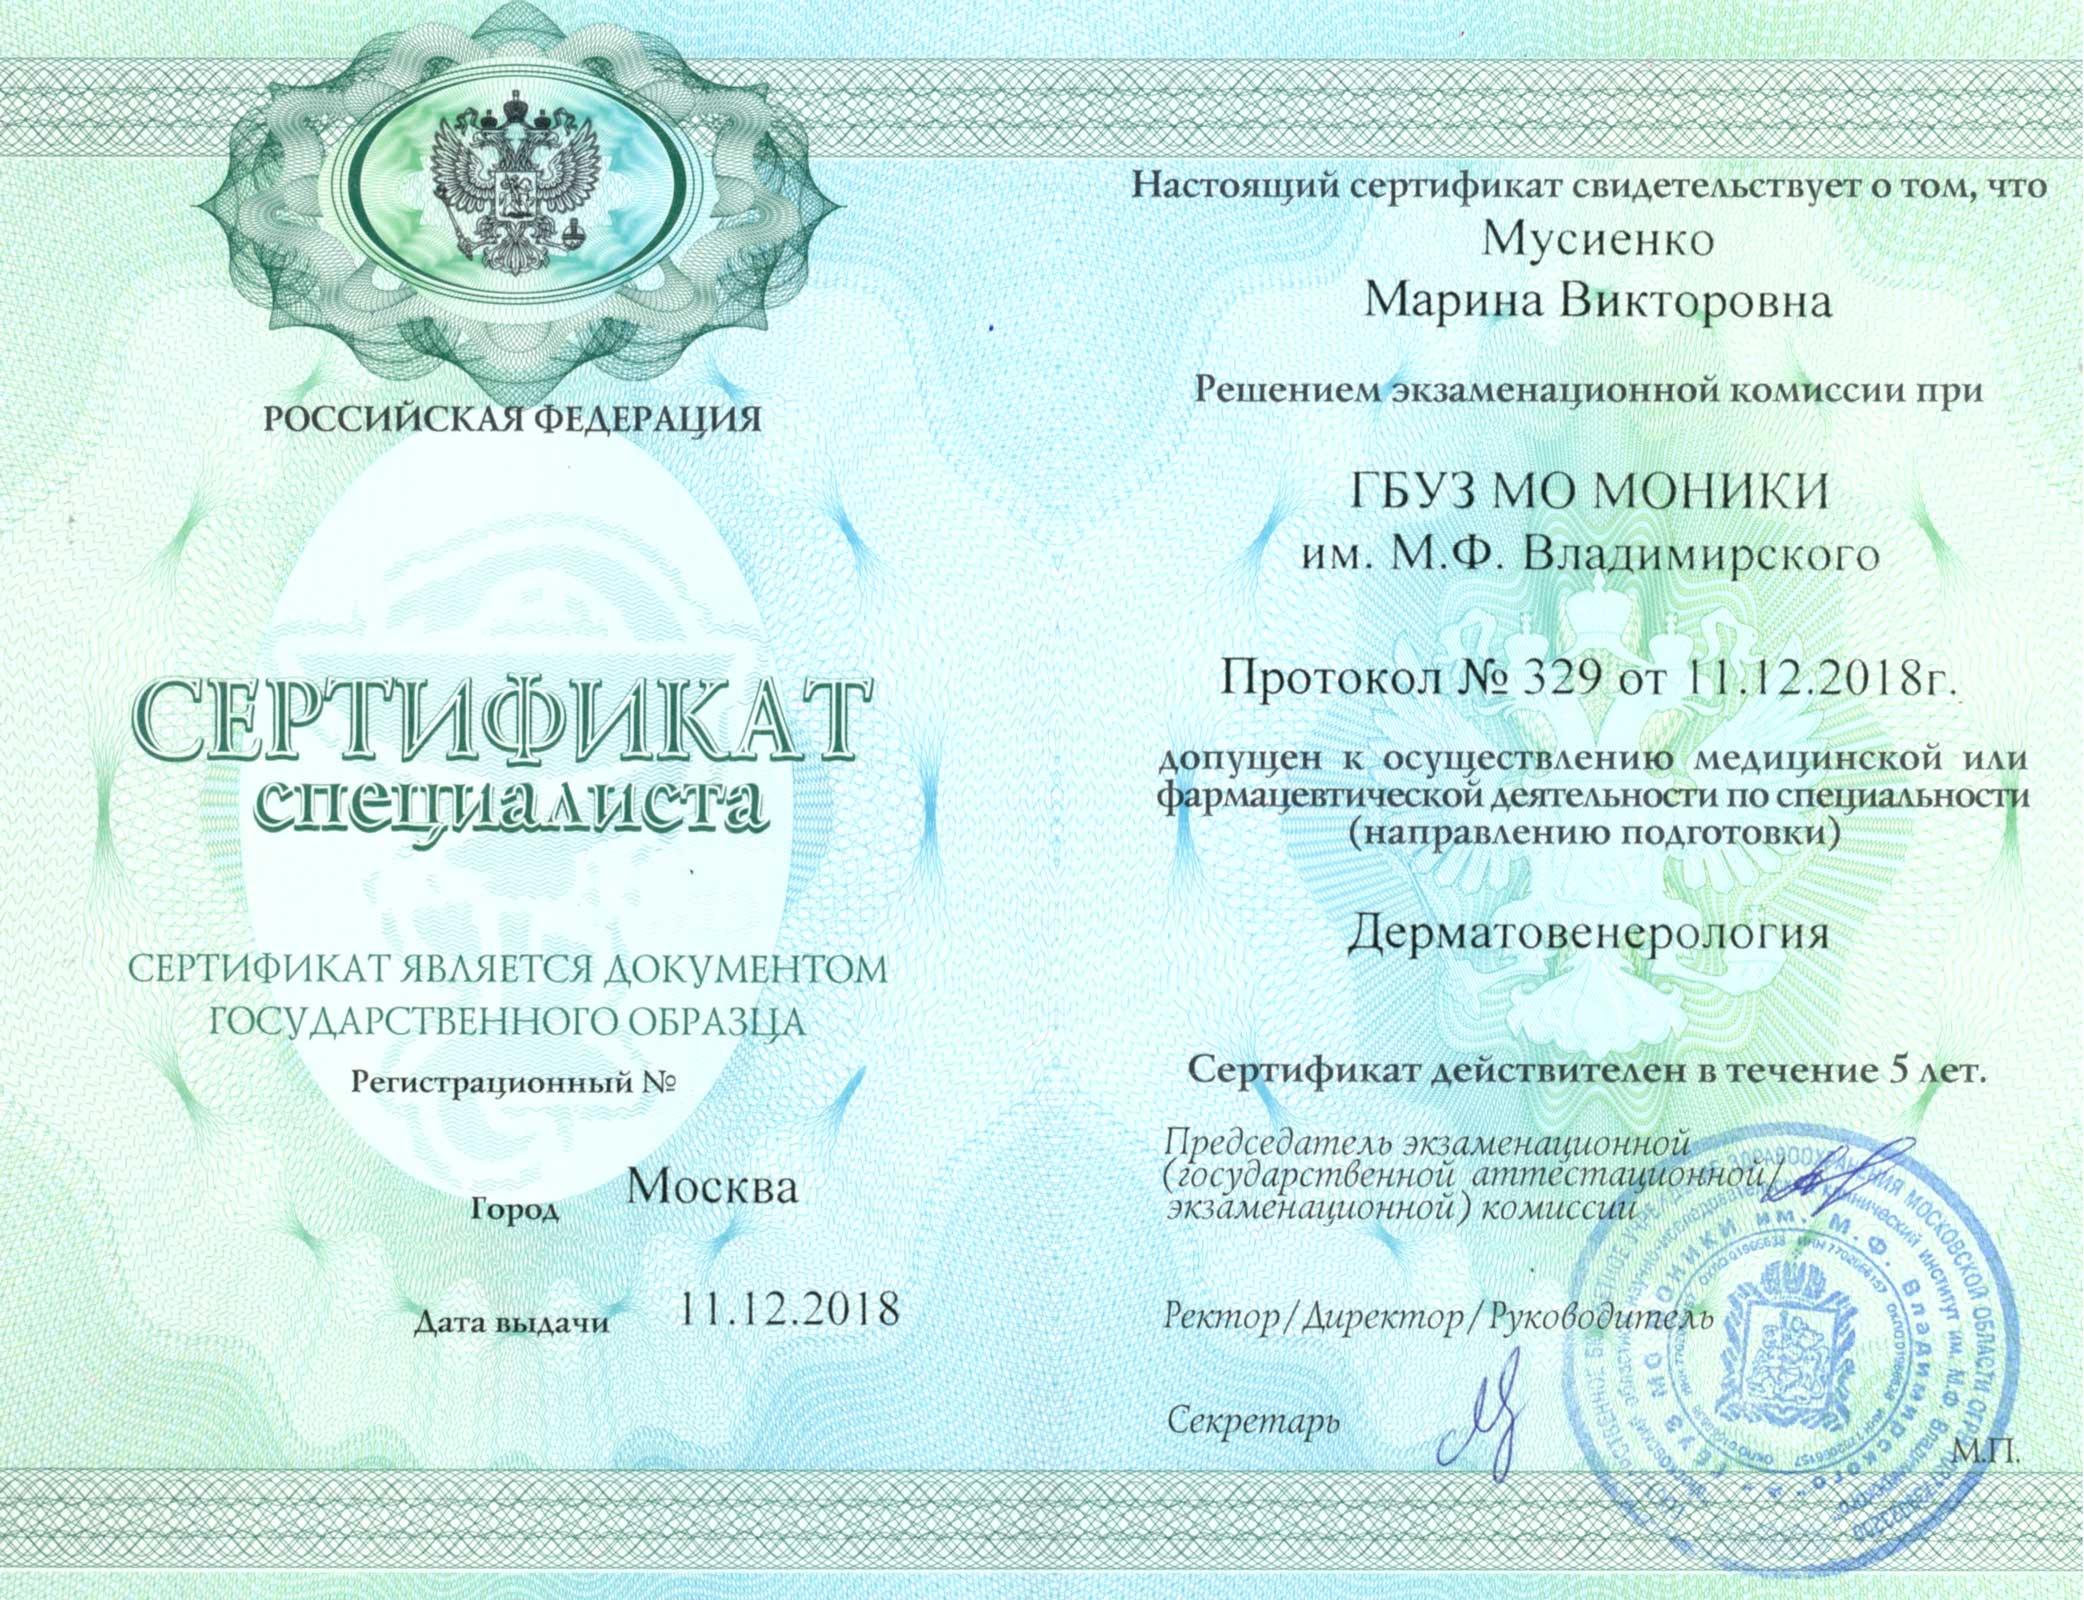 Врач-трихолог Мусиенко - Сертификат специалиста